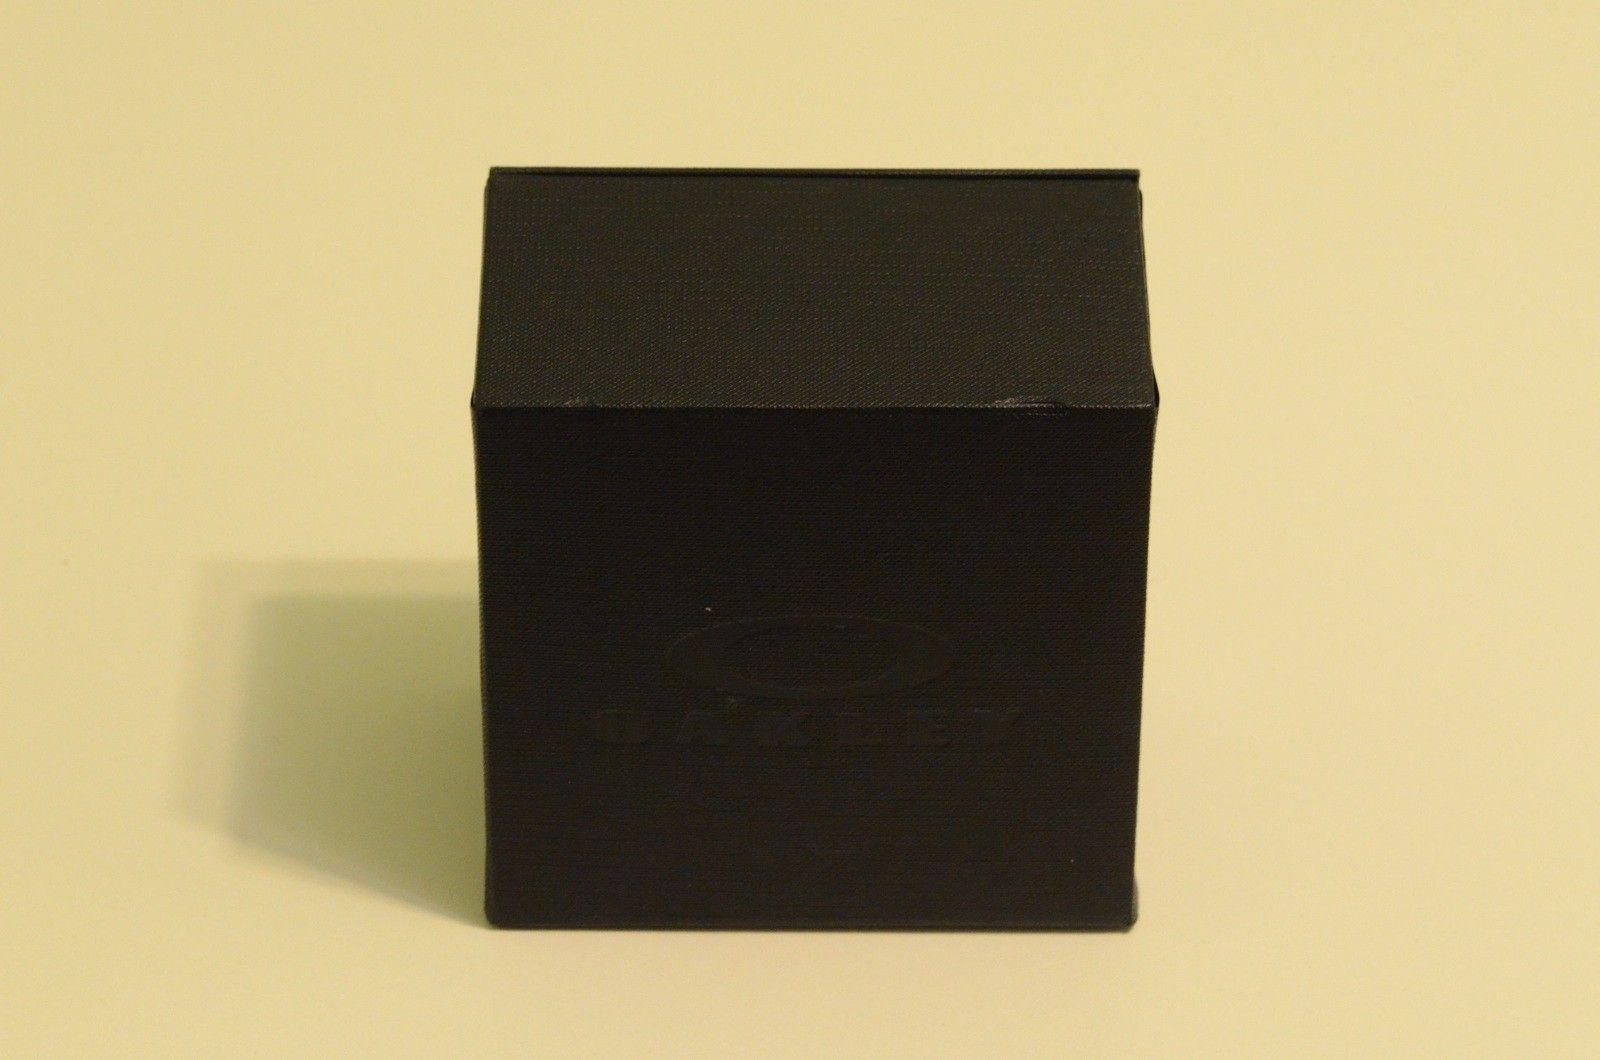 Gearbox Brushed Titanium- Carbon Fiber Dial SOLD! - DSC_0439.JPG